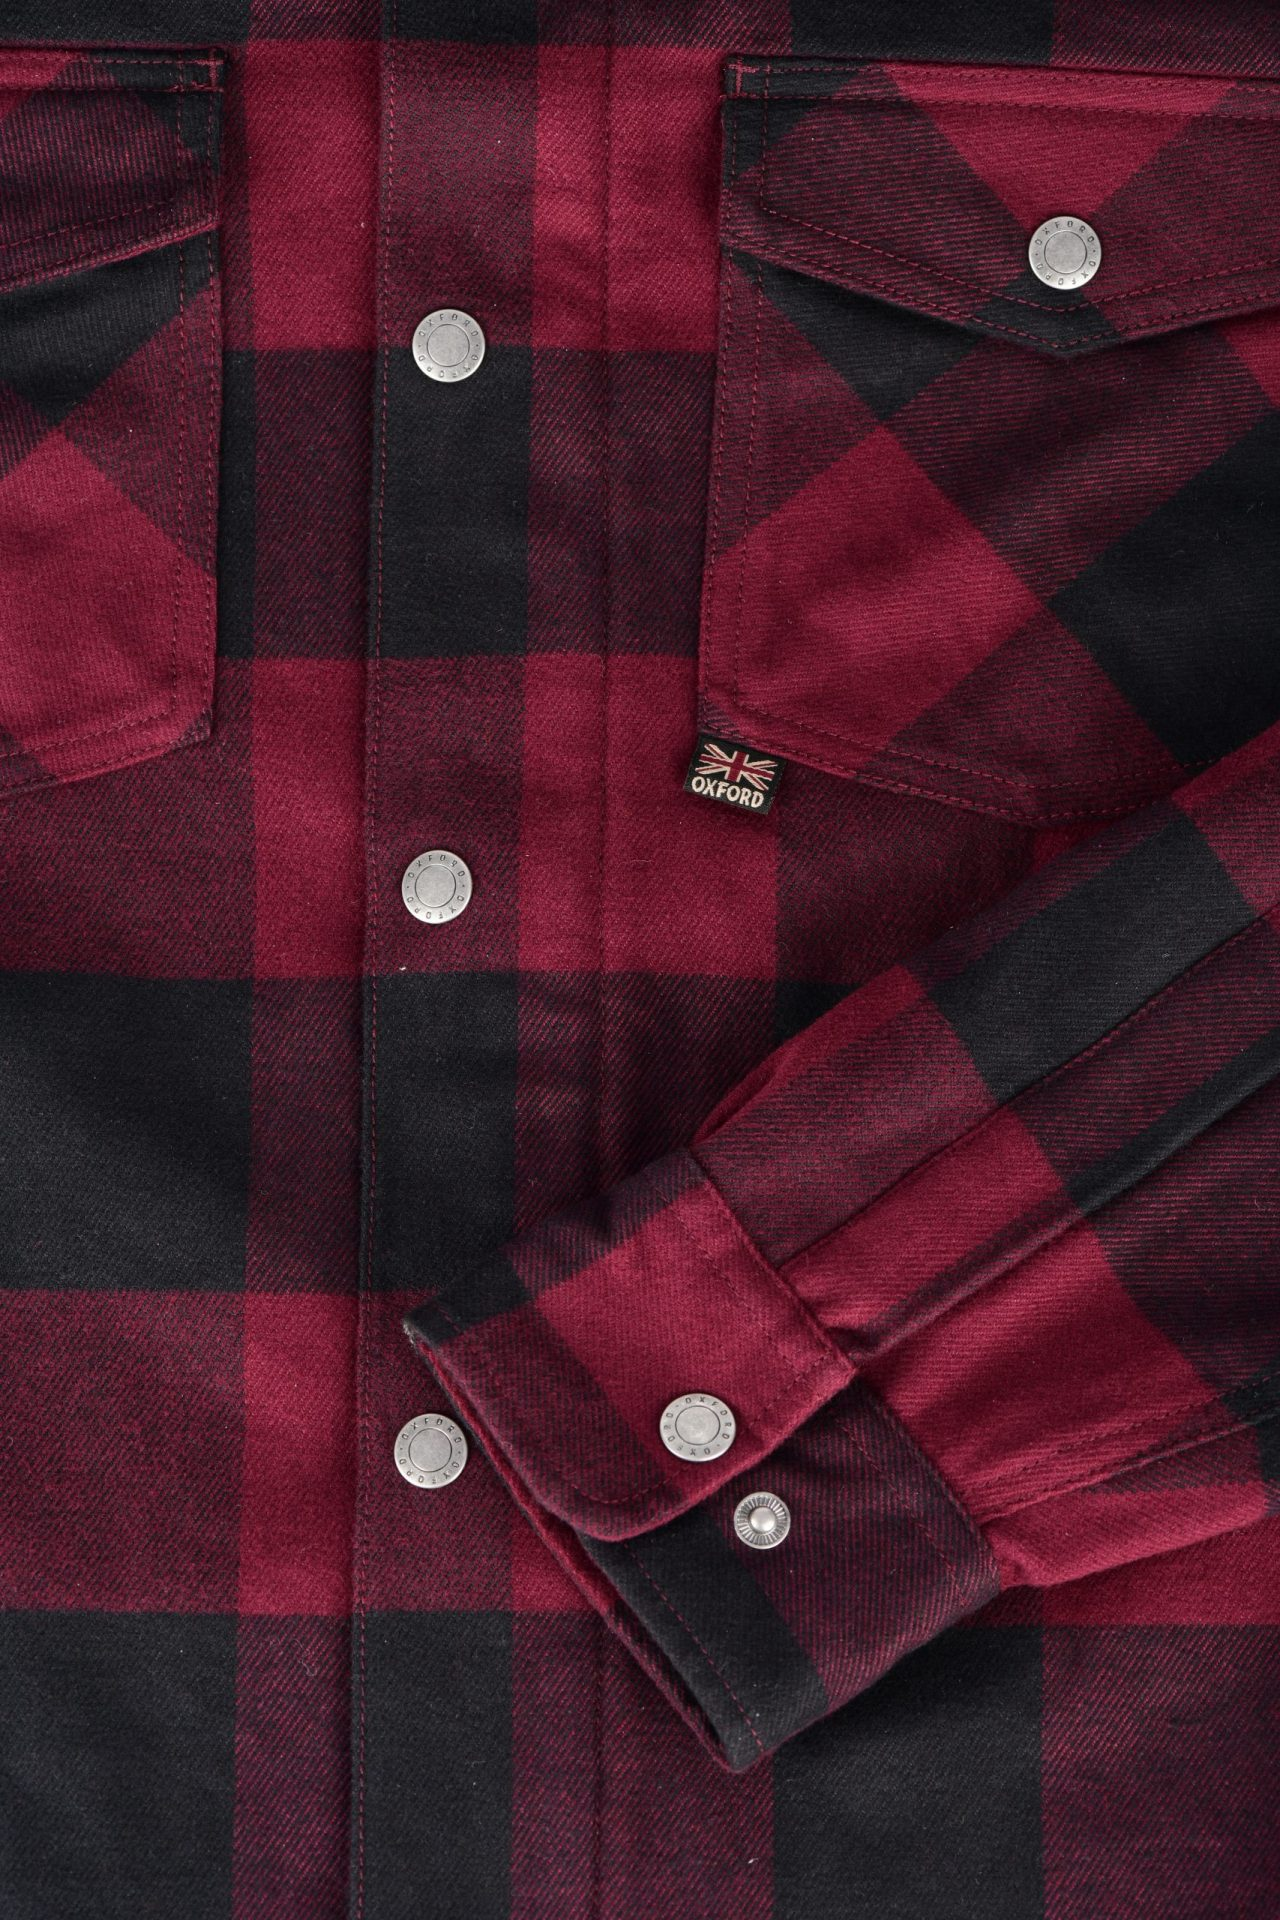 Kickback_Detail_1-scaled Kickback 2.0 Shirt